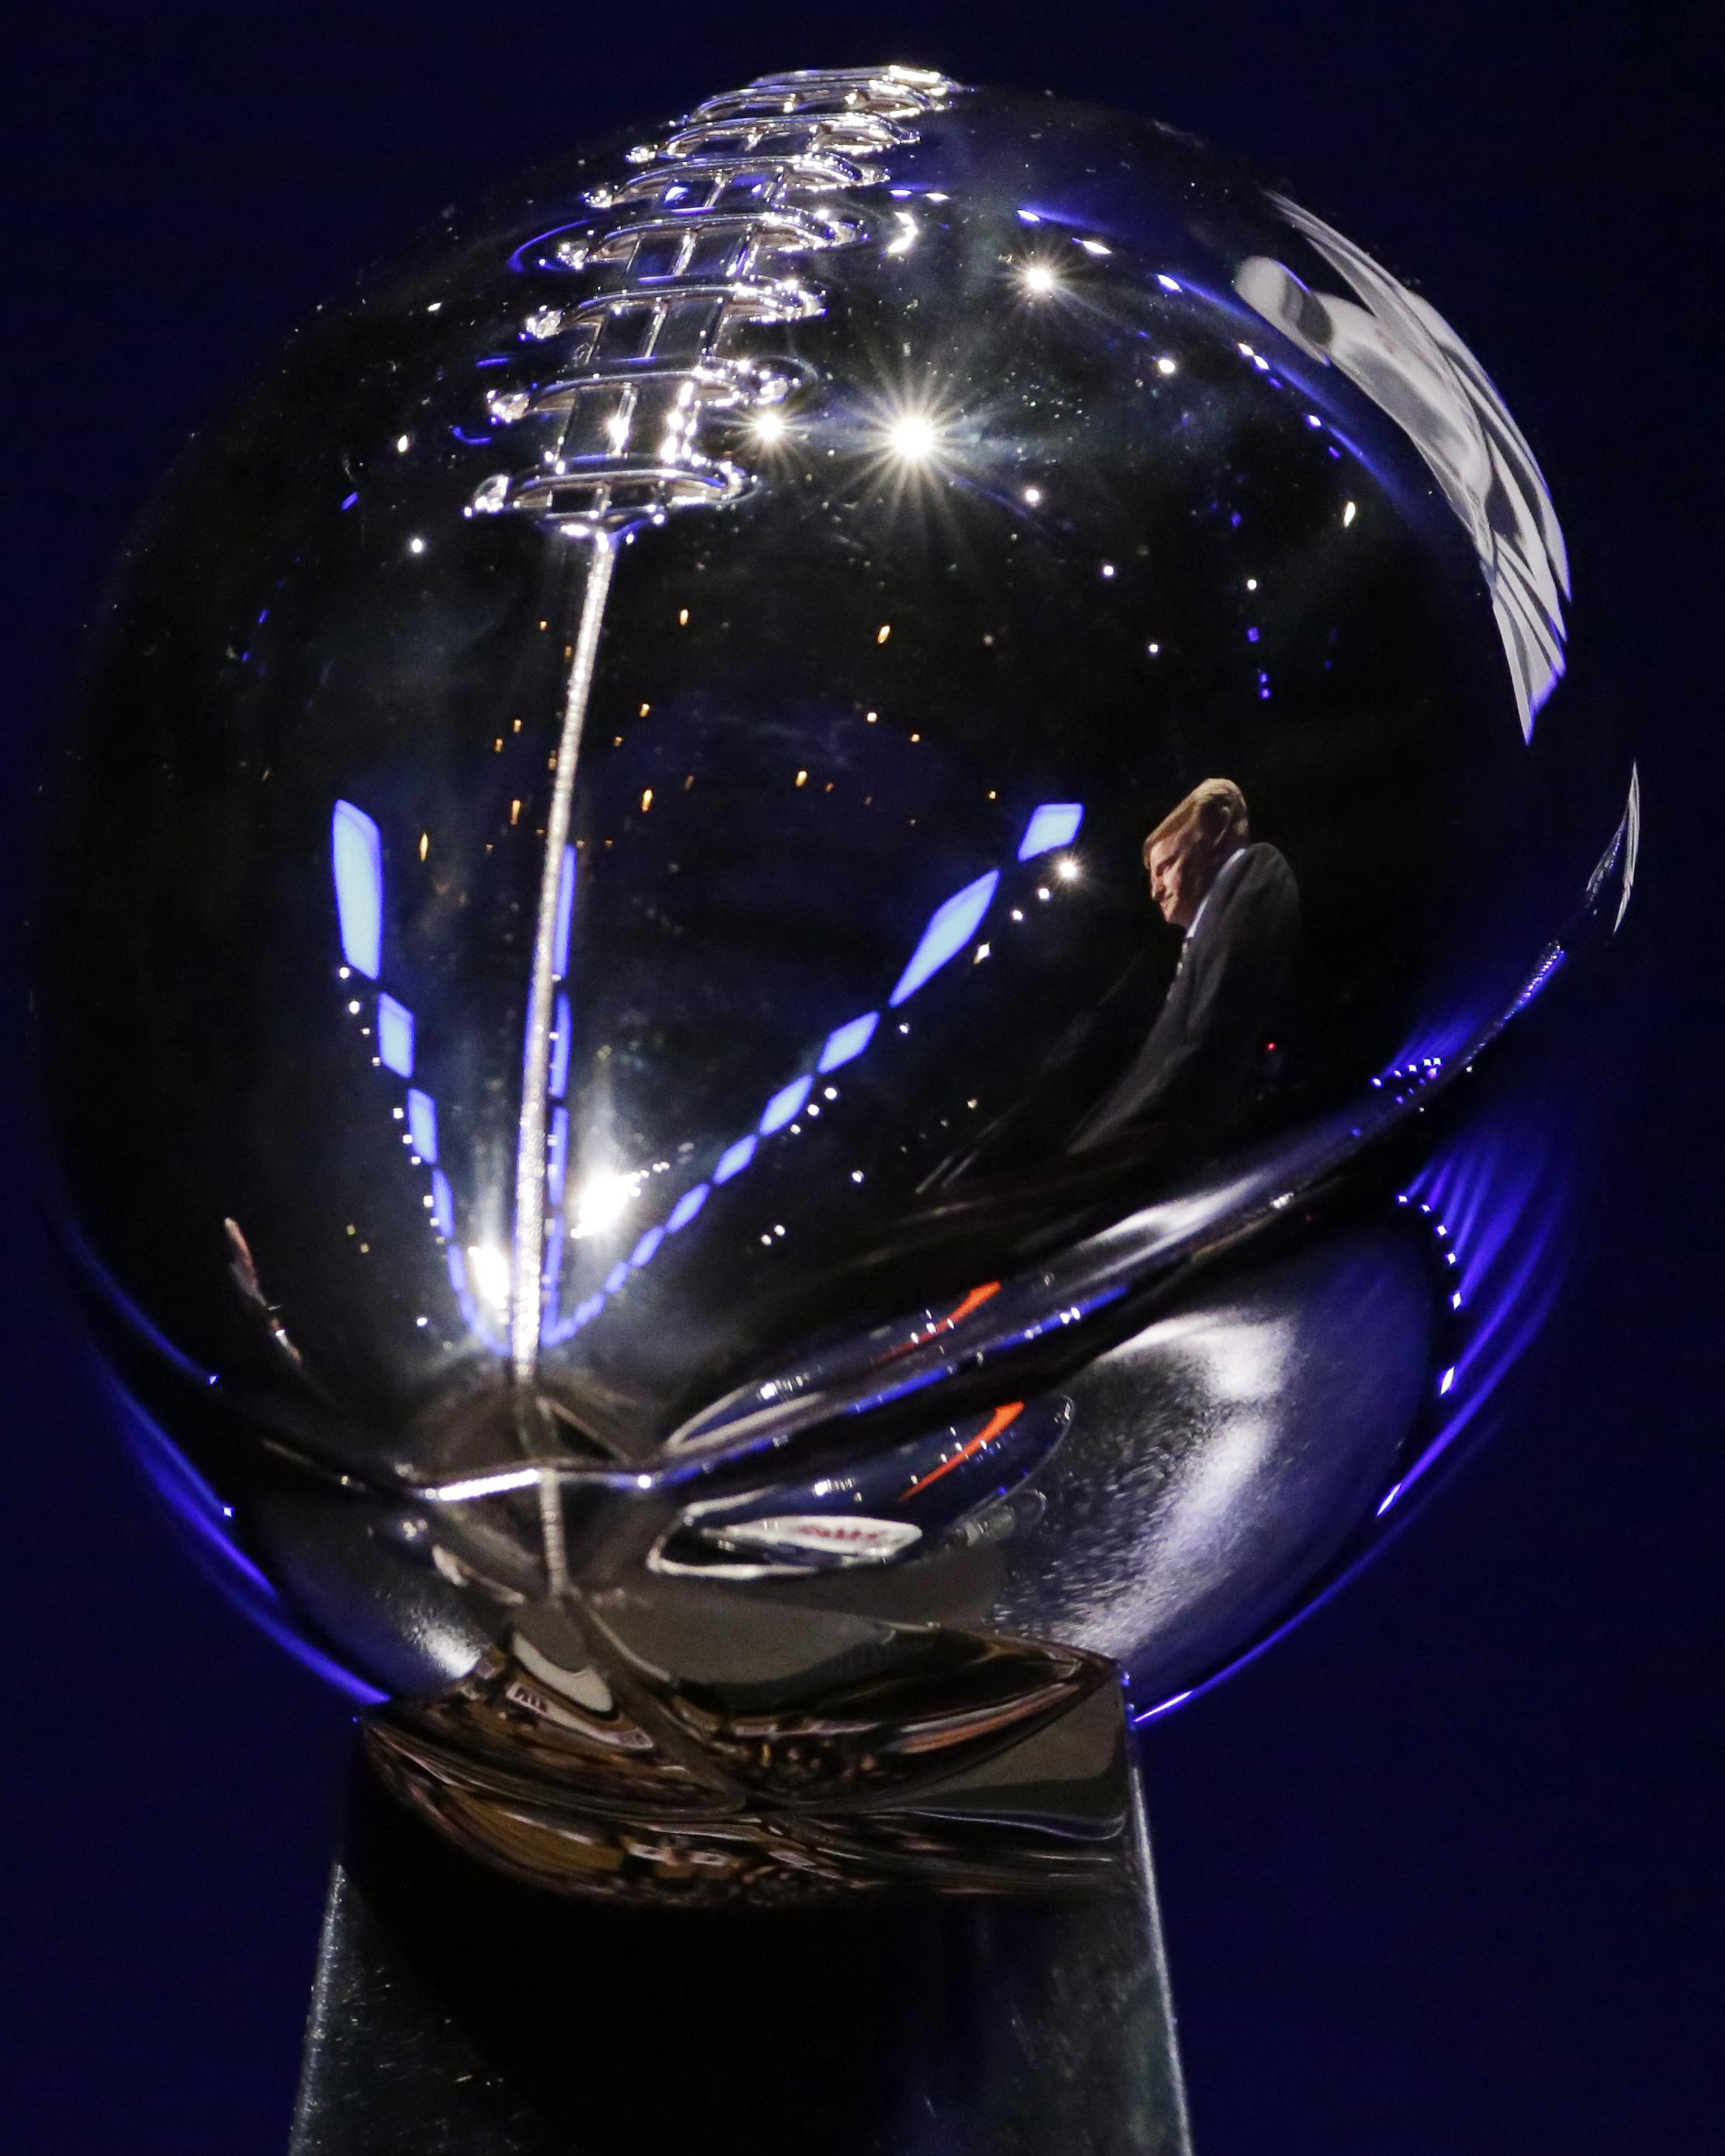 Broncos, Seahawks Make Final Super Bowl Preps